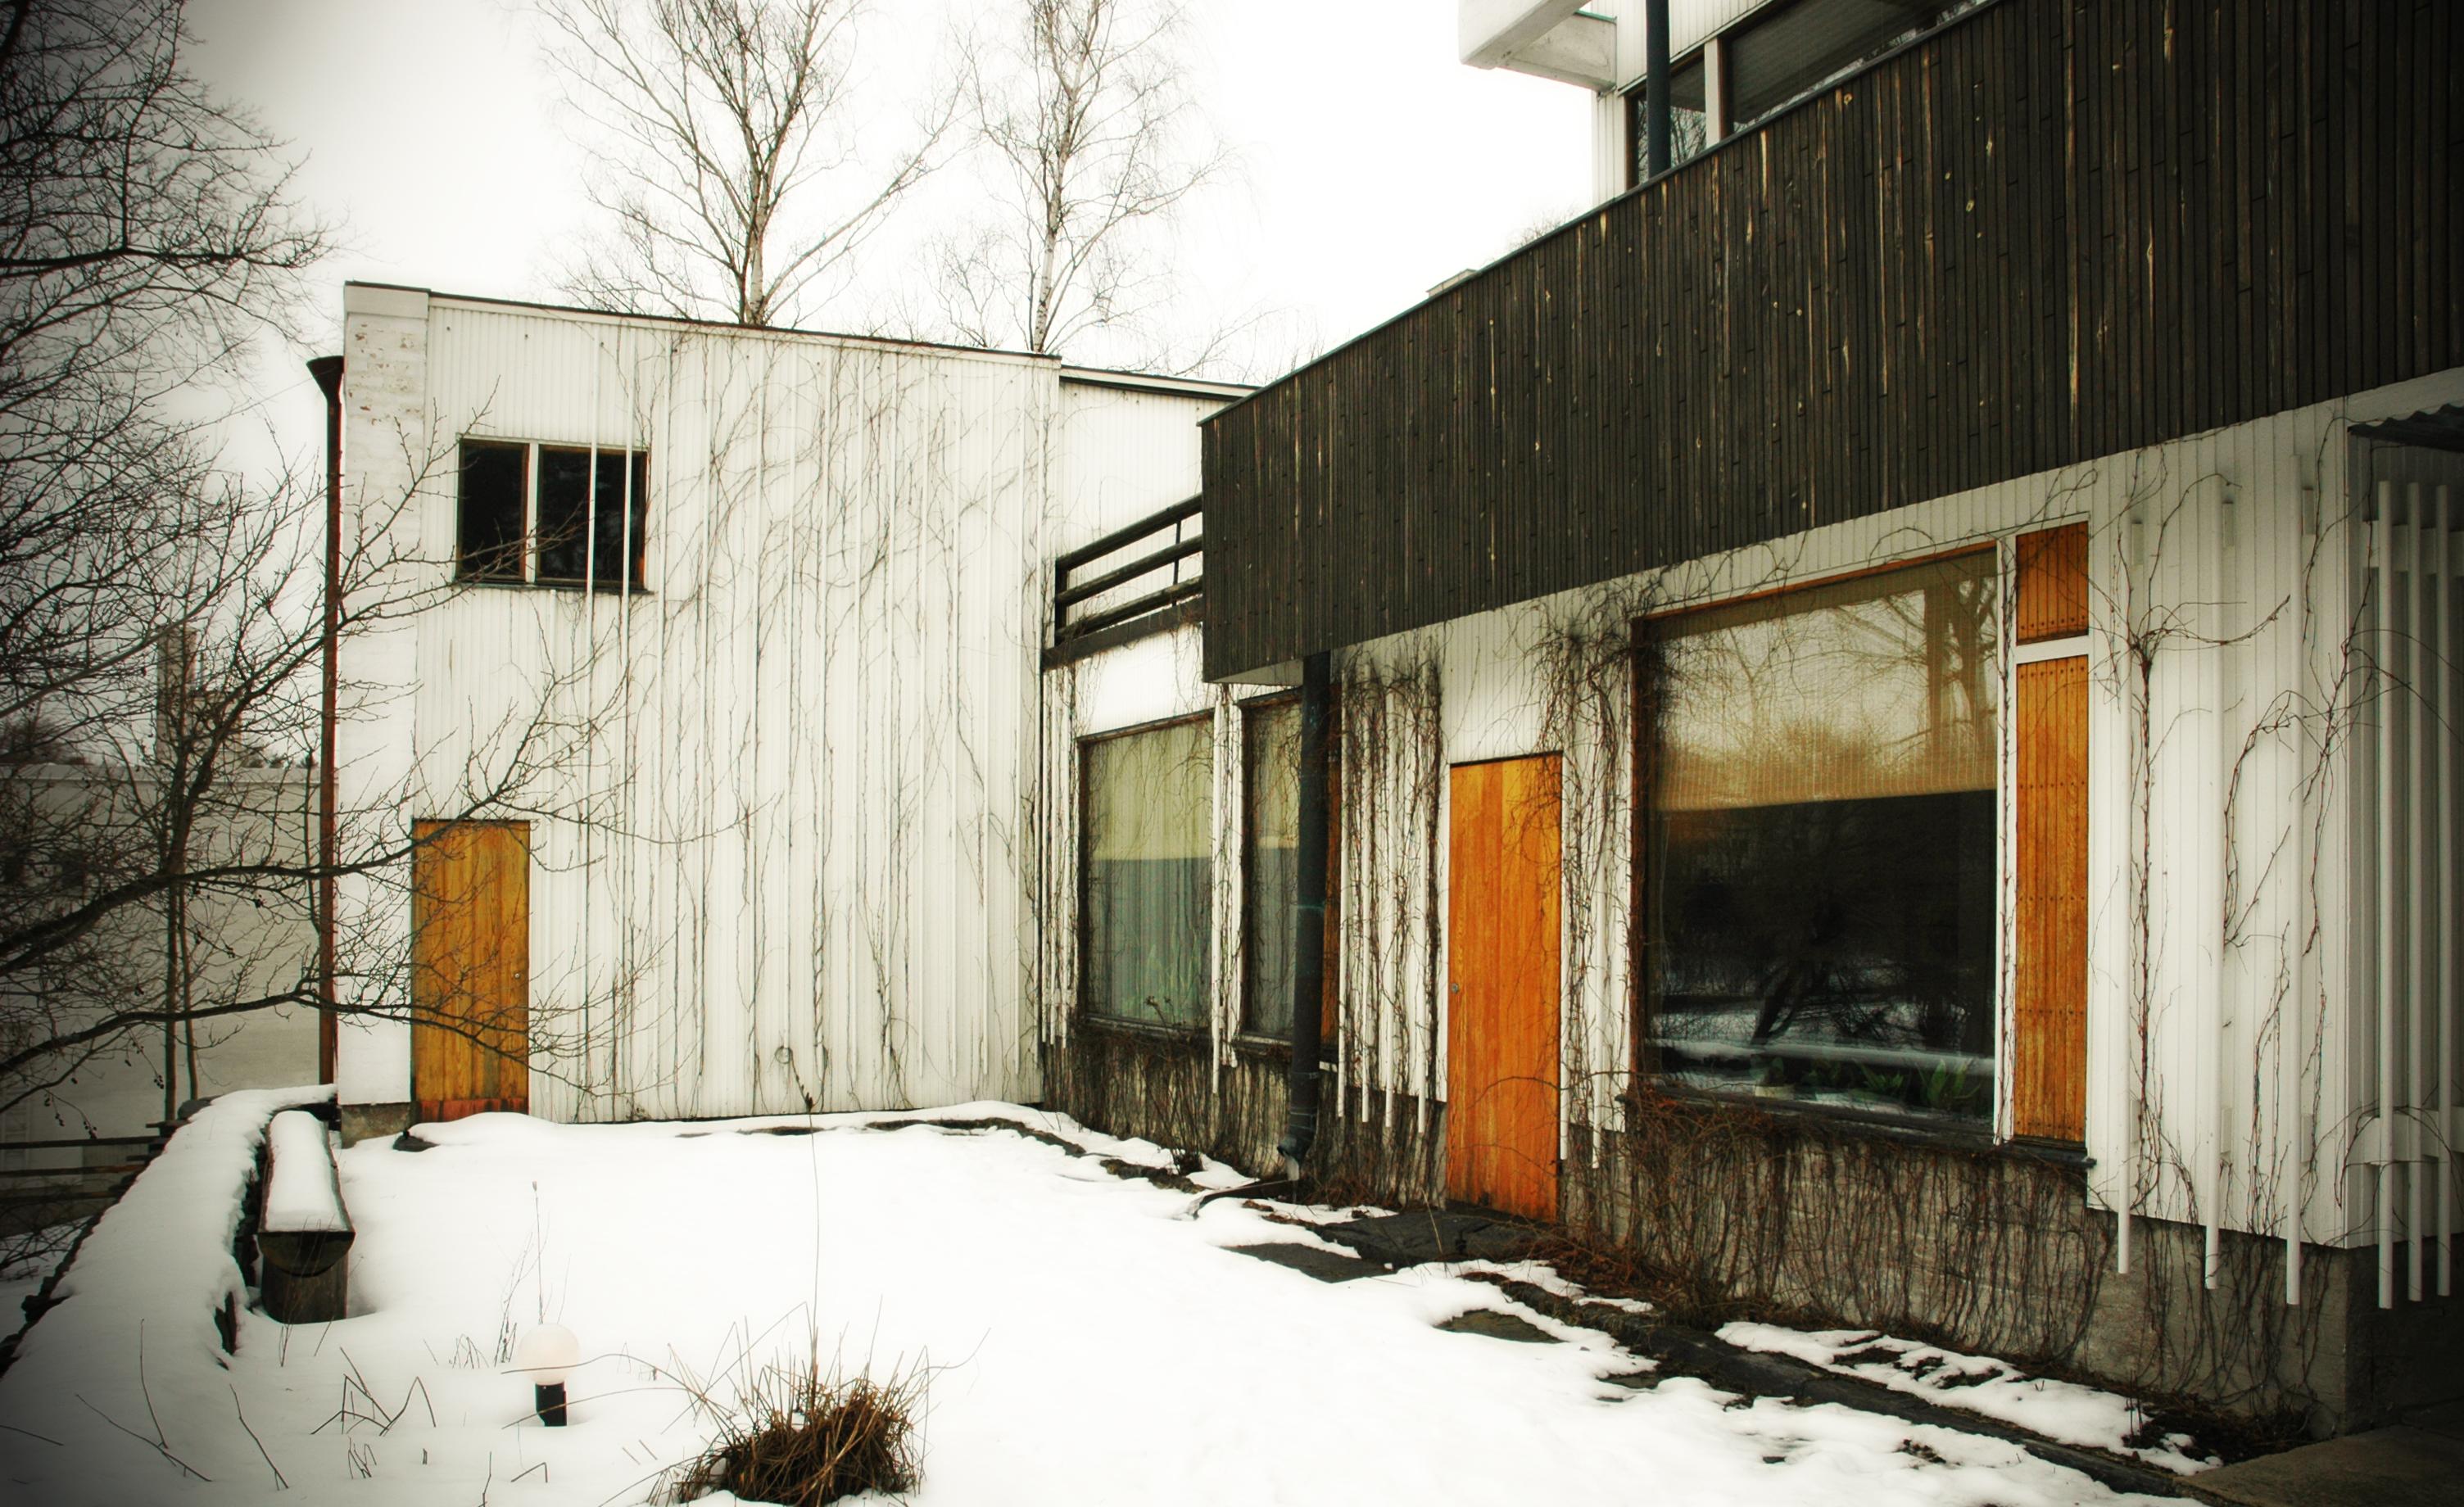 Alvar aalto house alvar aalto helsinki finlandia archher for Studio house